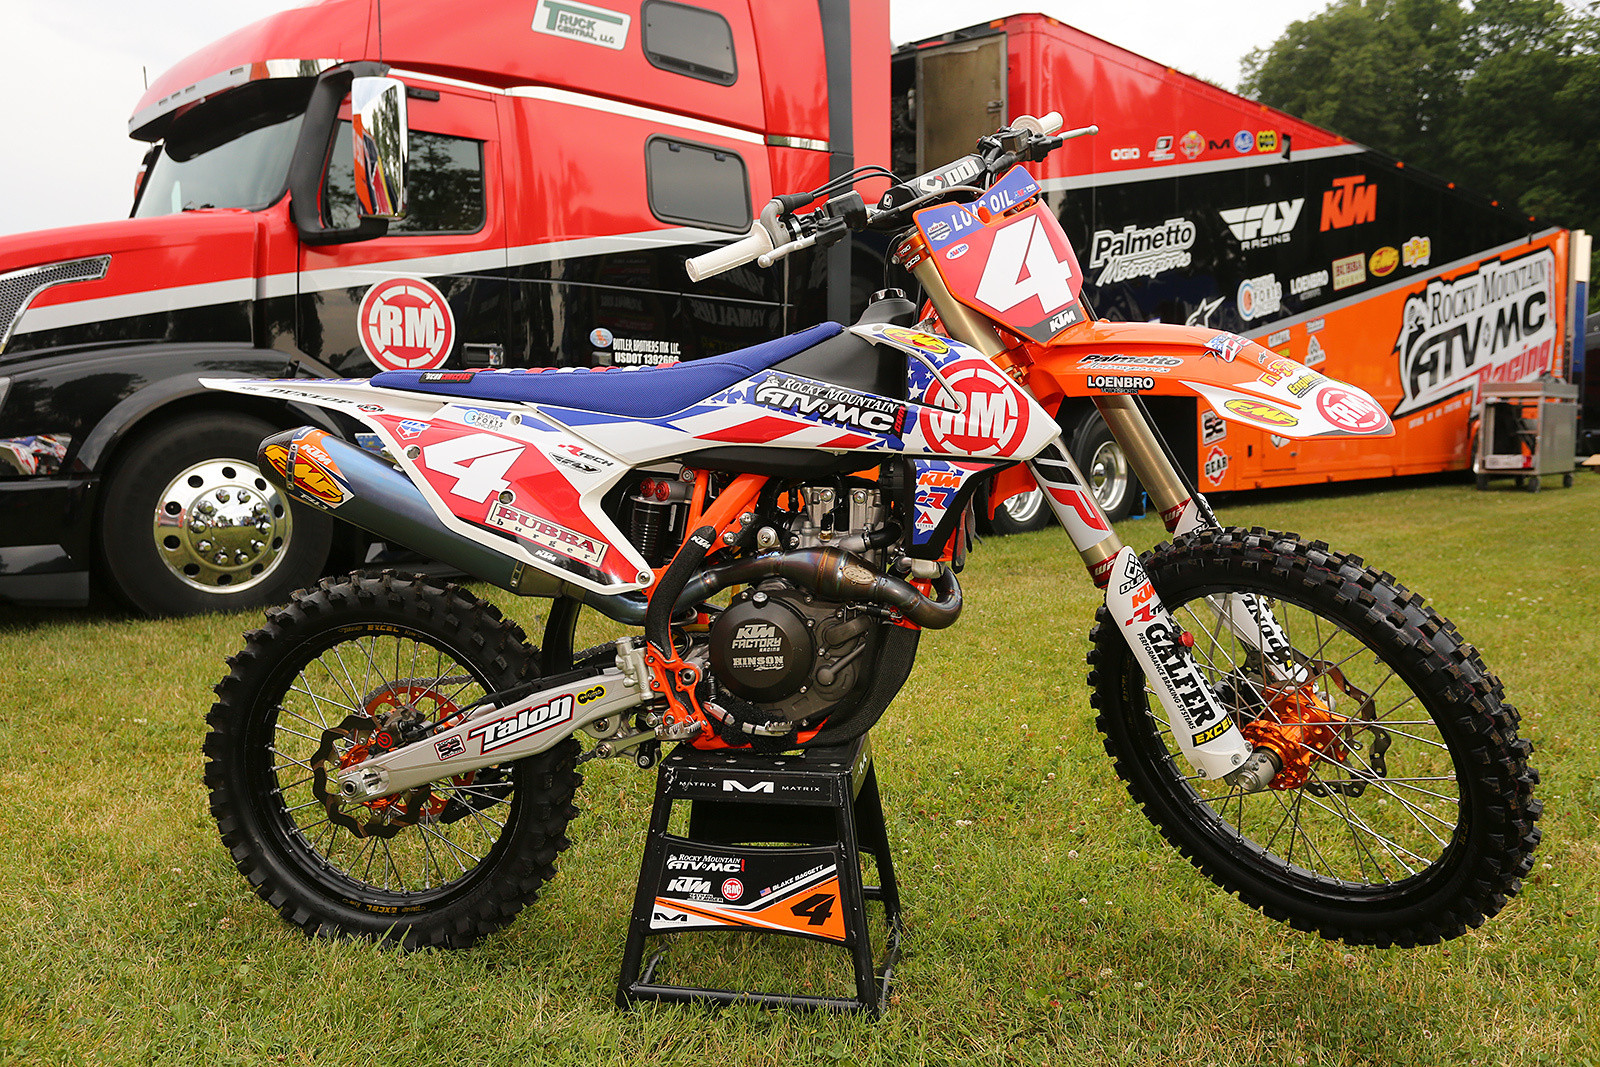 Blake Baggett's Rocky Mountain ATV/MC-KTM-WPS 450.